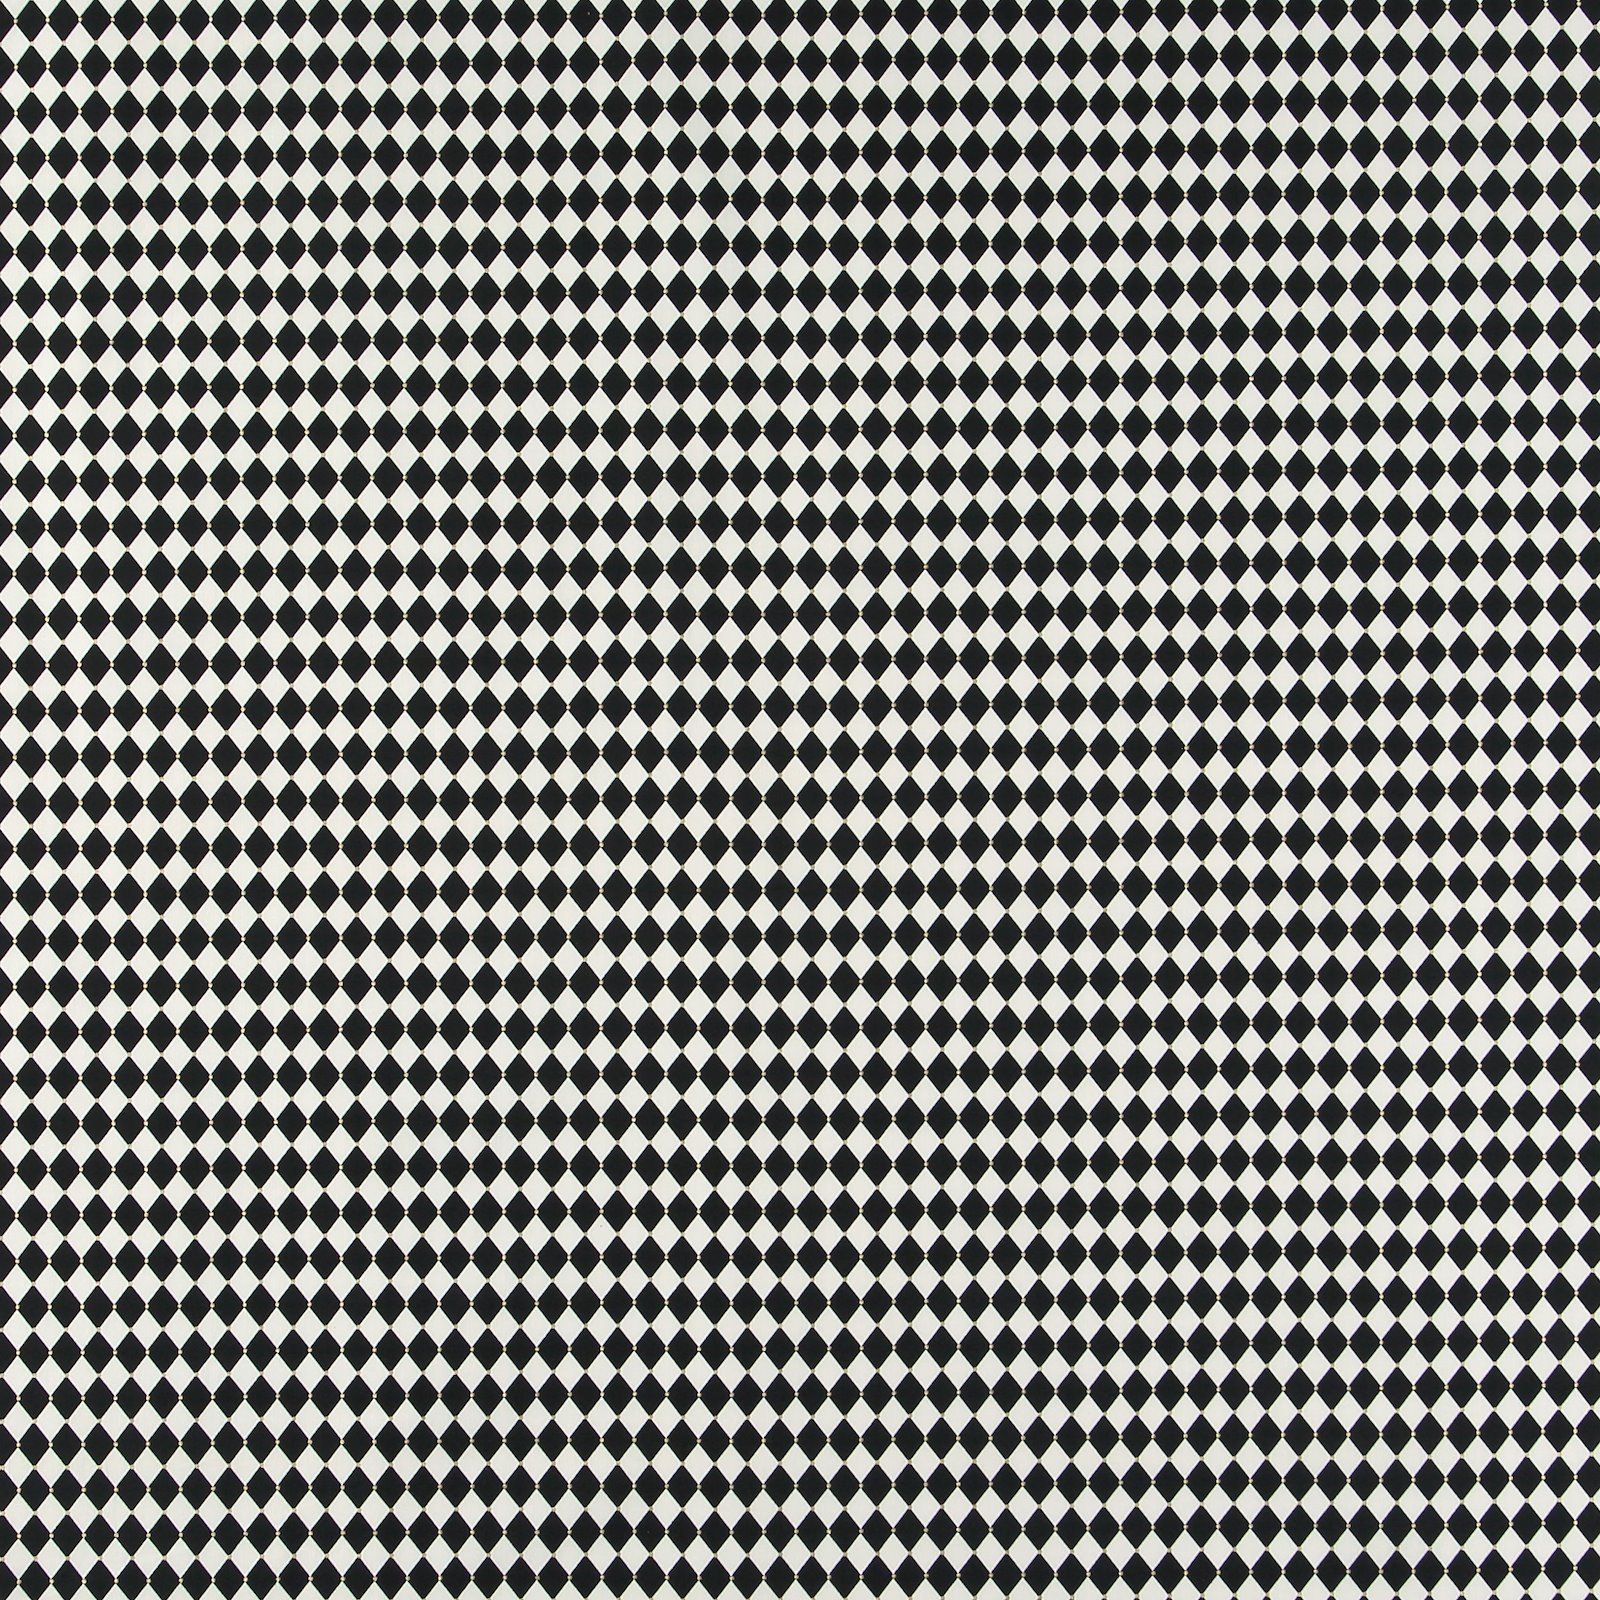 Cotton black and white harlequin checks 852394_pack_sp